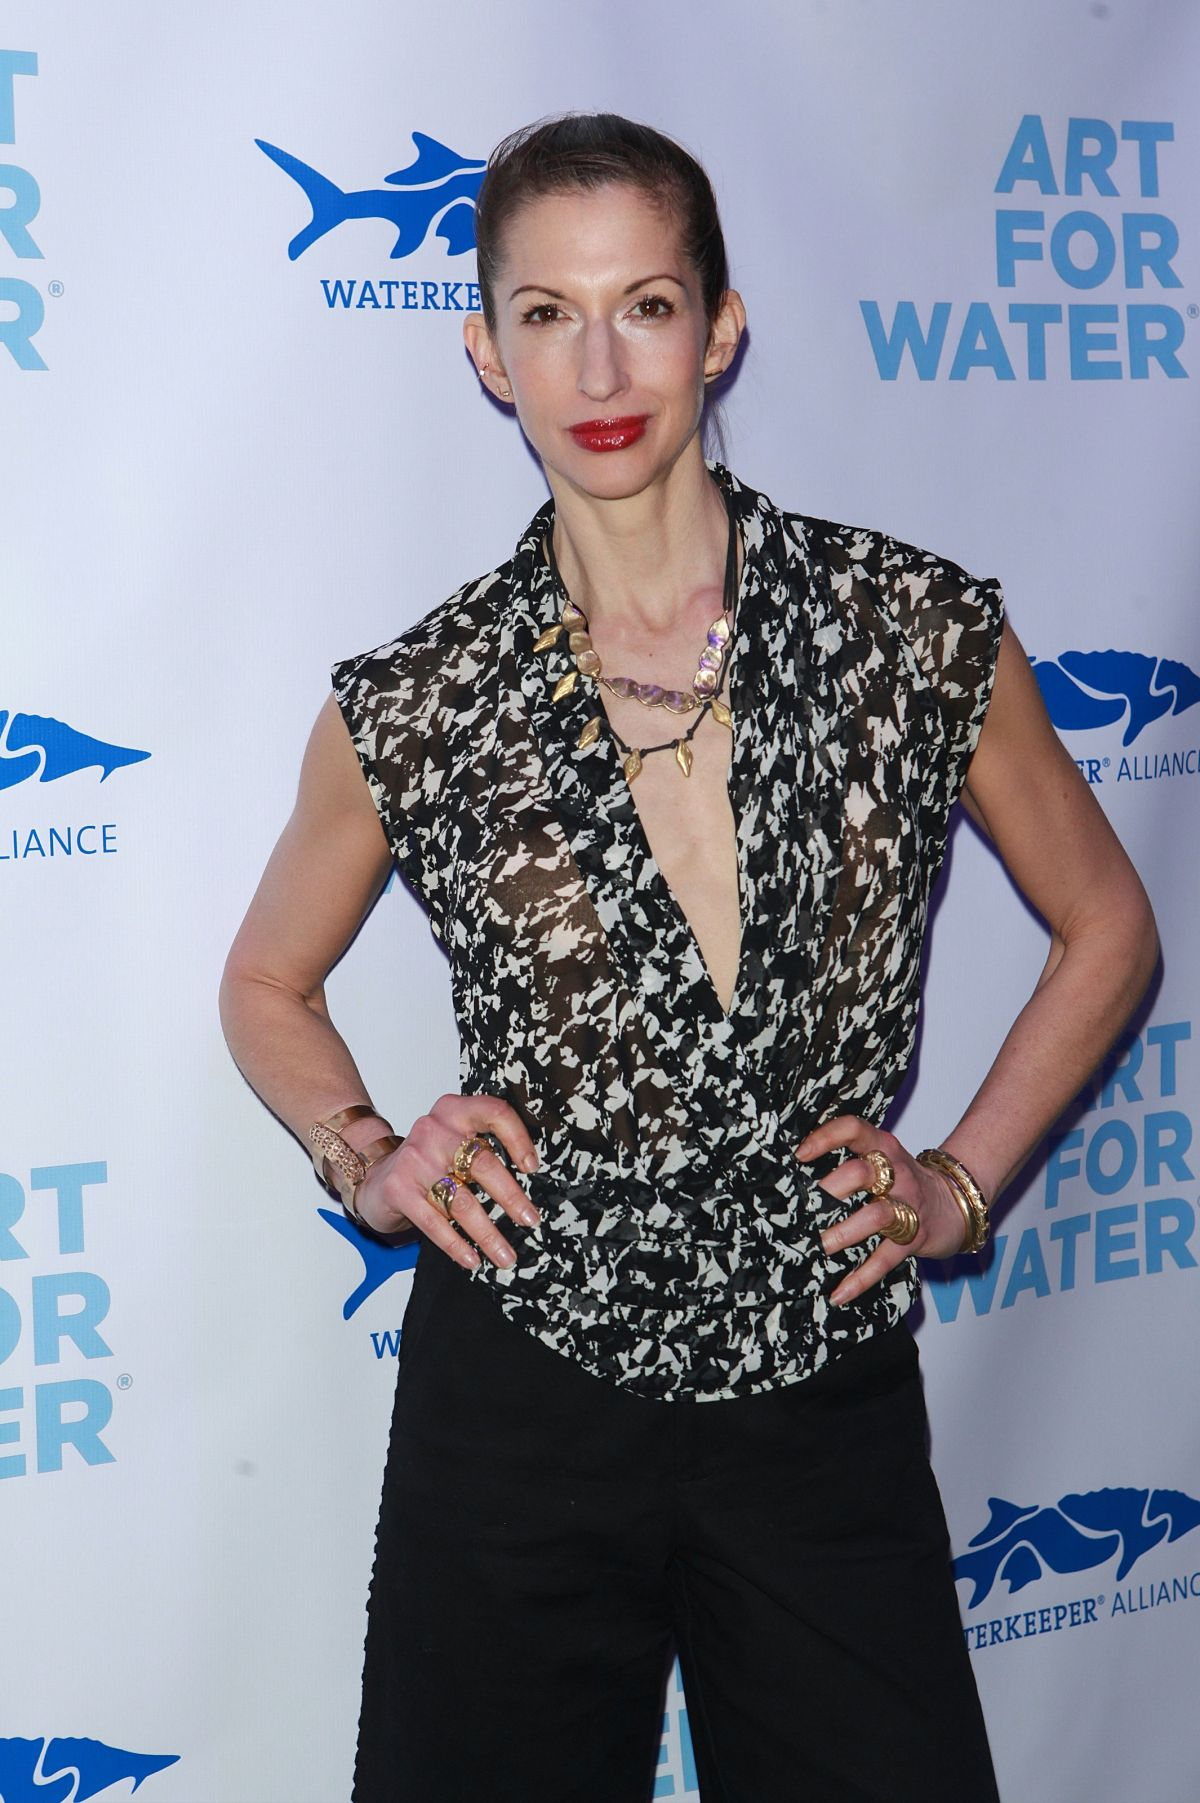 ALYSIA REINER at Art for Water Benefiring Waterkeeper Alliance Charity in New York 02/06/2017